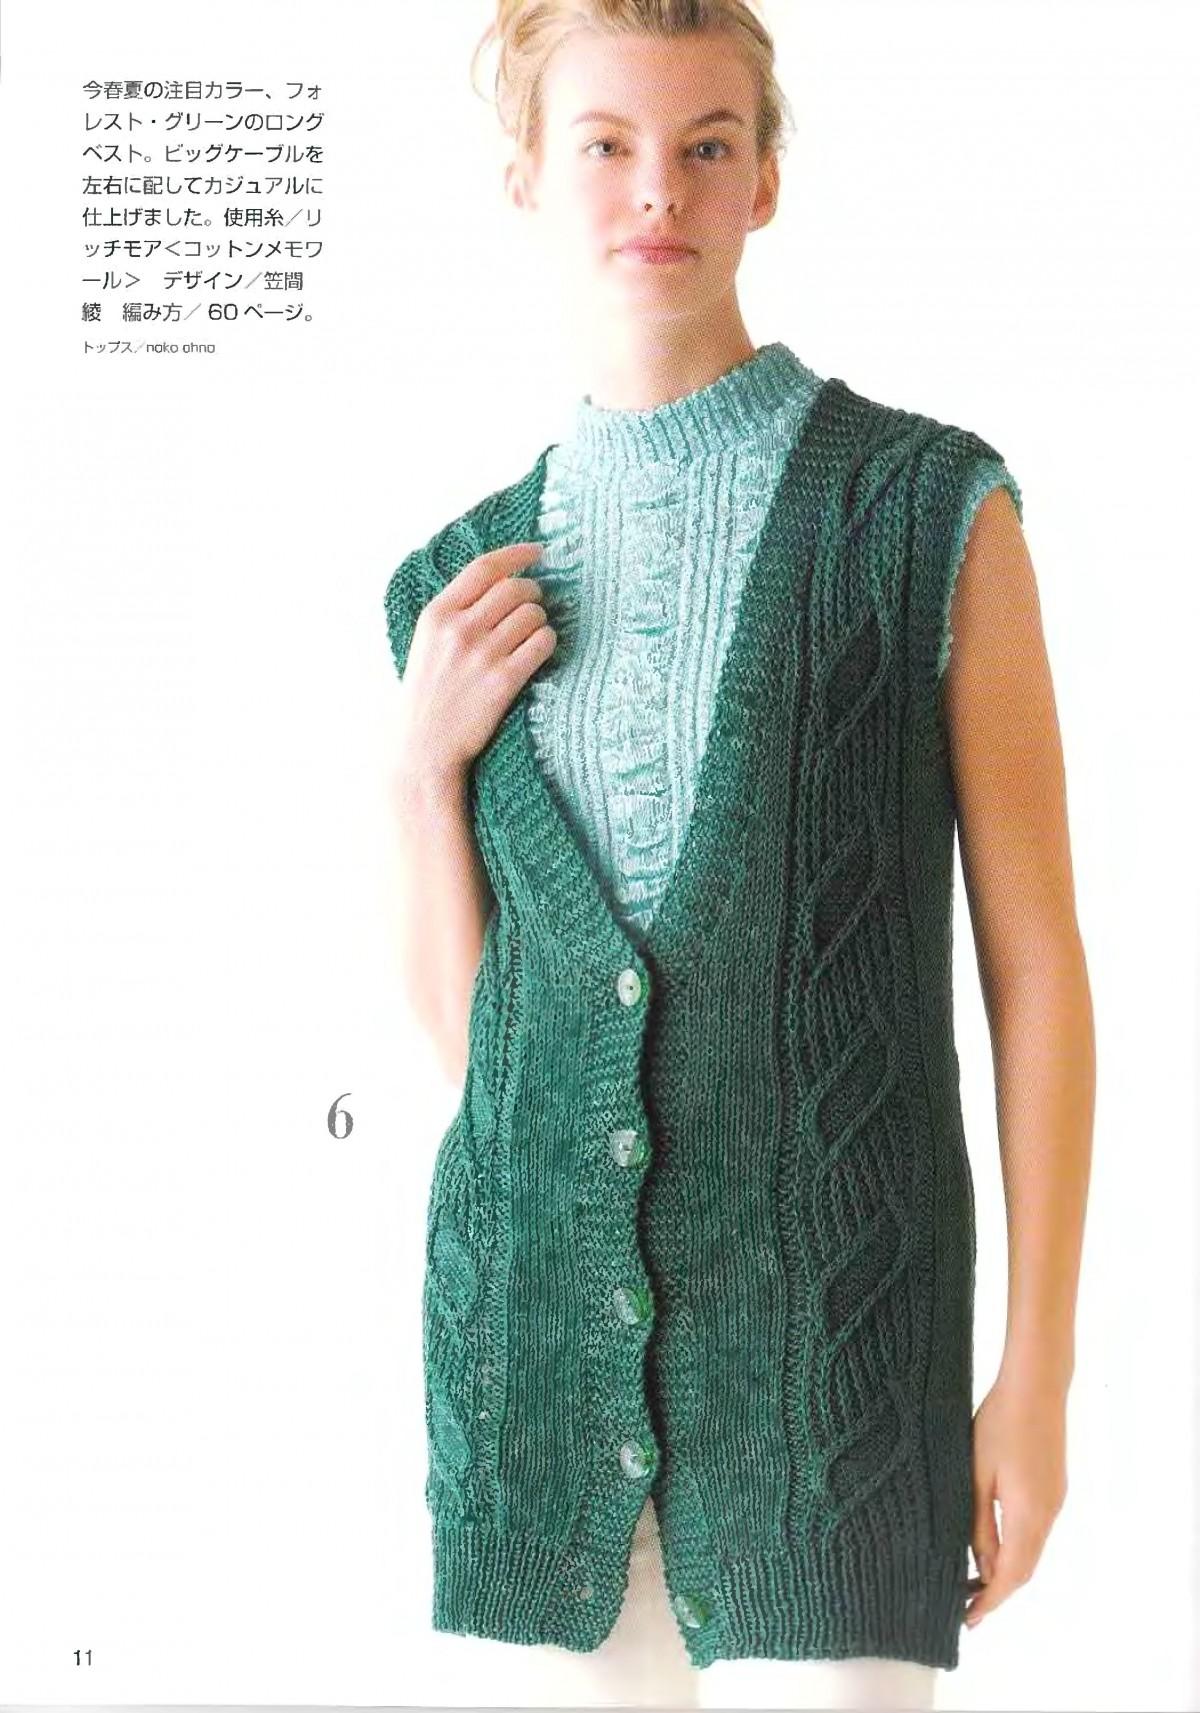 Lets-knit-series-NV4359-2008-Spring-Summer-sp-kr_9.jpg